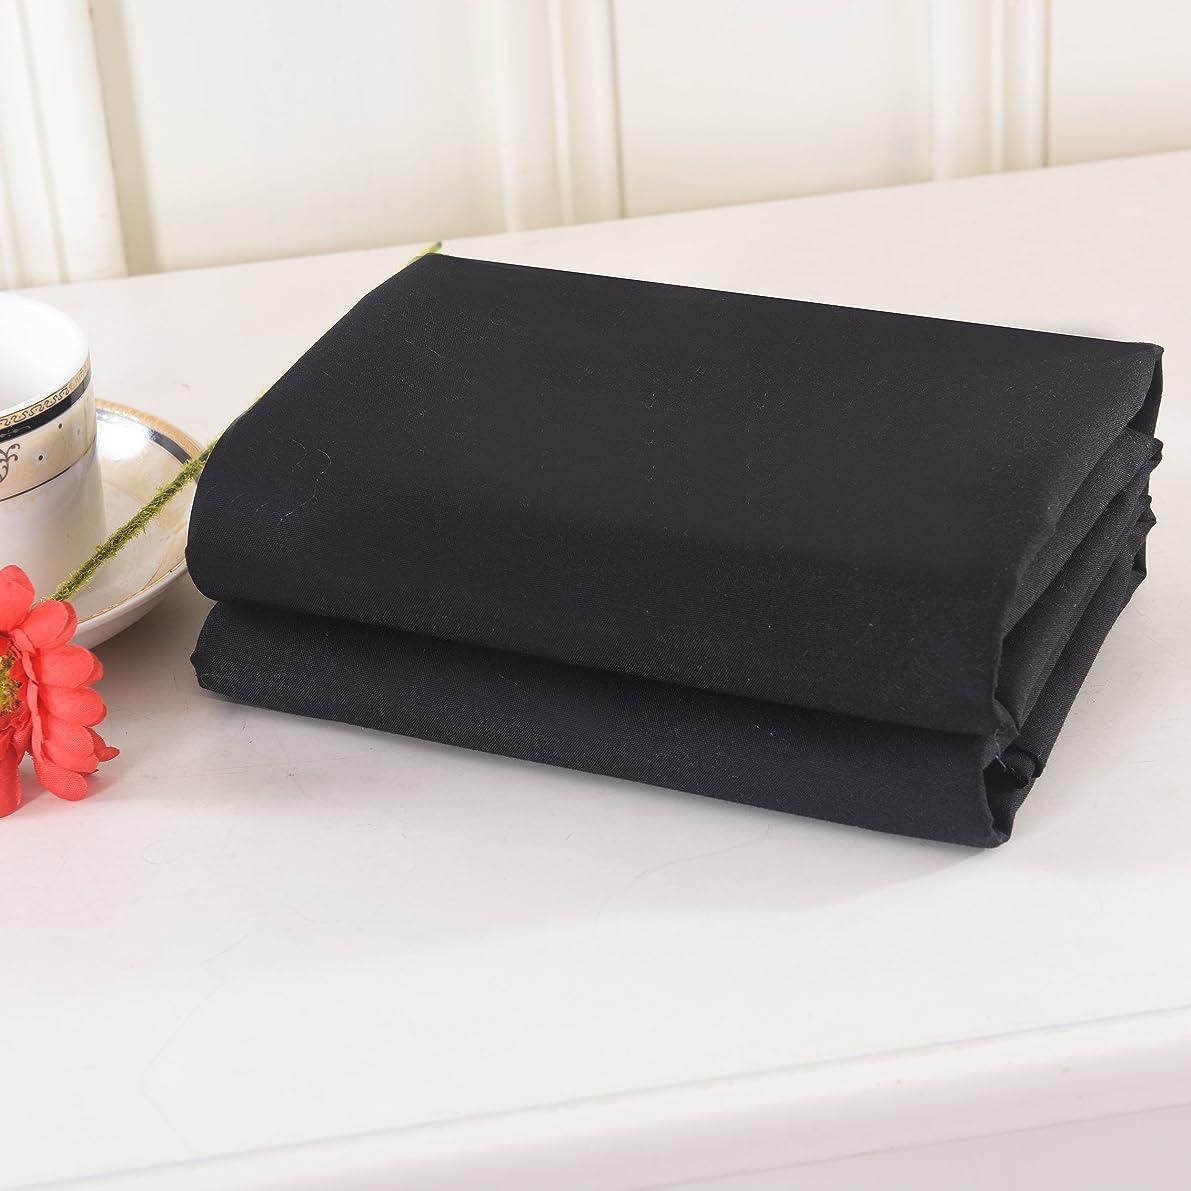 Lullabi Bedding 100% Brushed Microfiber Ultra Soft Pillow Case Set of 2 - Envelope Closure End - Wrinkle, Fade, Stain Resistant, Standard-Queen Size Pillowcase (Black)